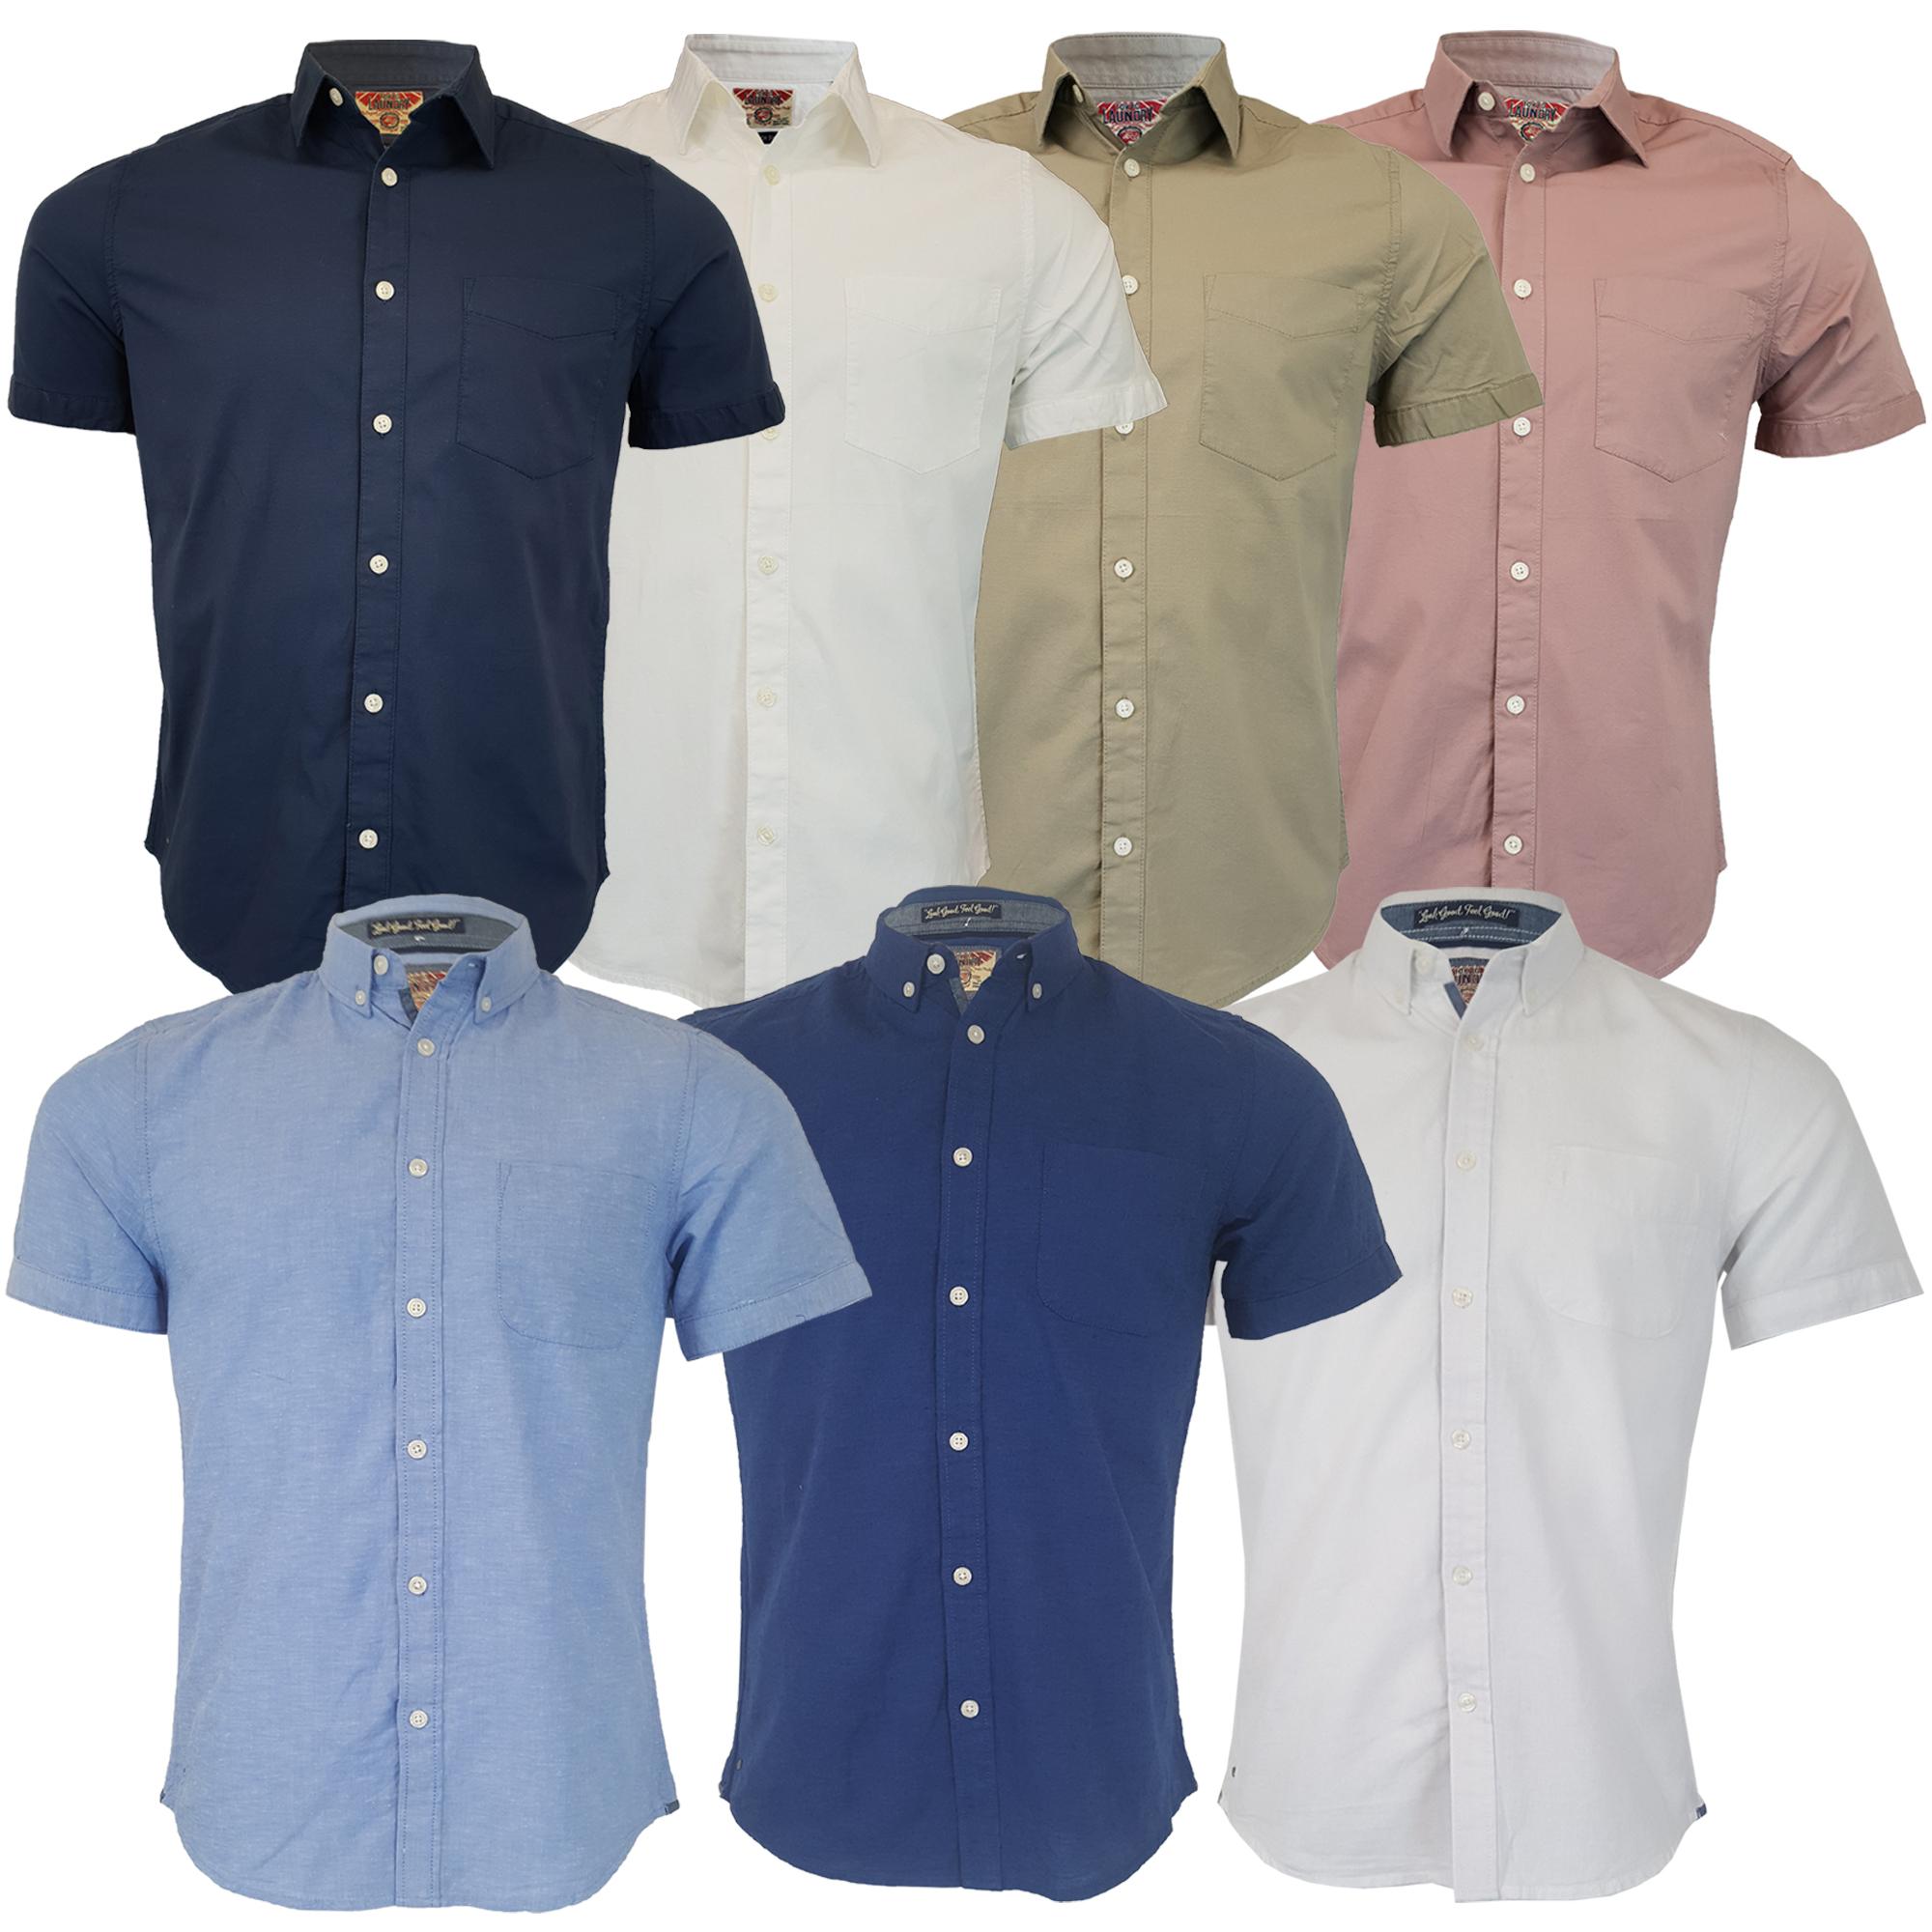 Mens-Linen-Cotton-Shirt-Tokyo-Laundry-Wells-Short-Sleeved-Grosvenor-Summer-New thumbnail 4